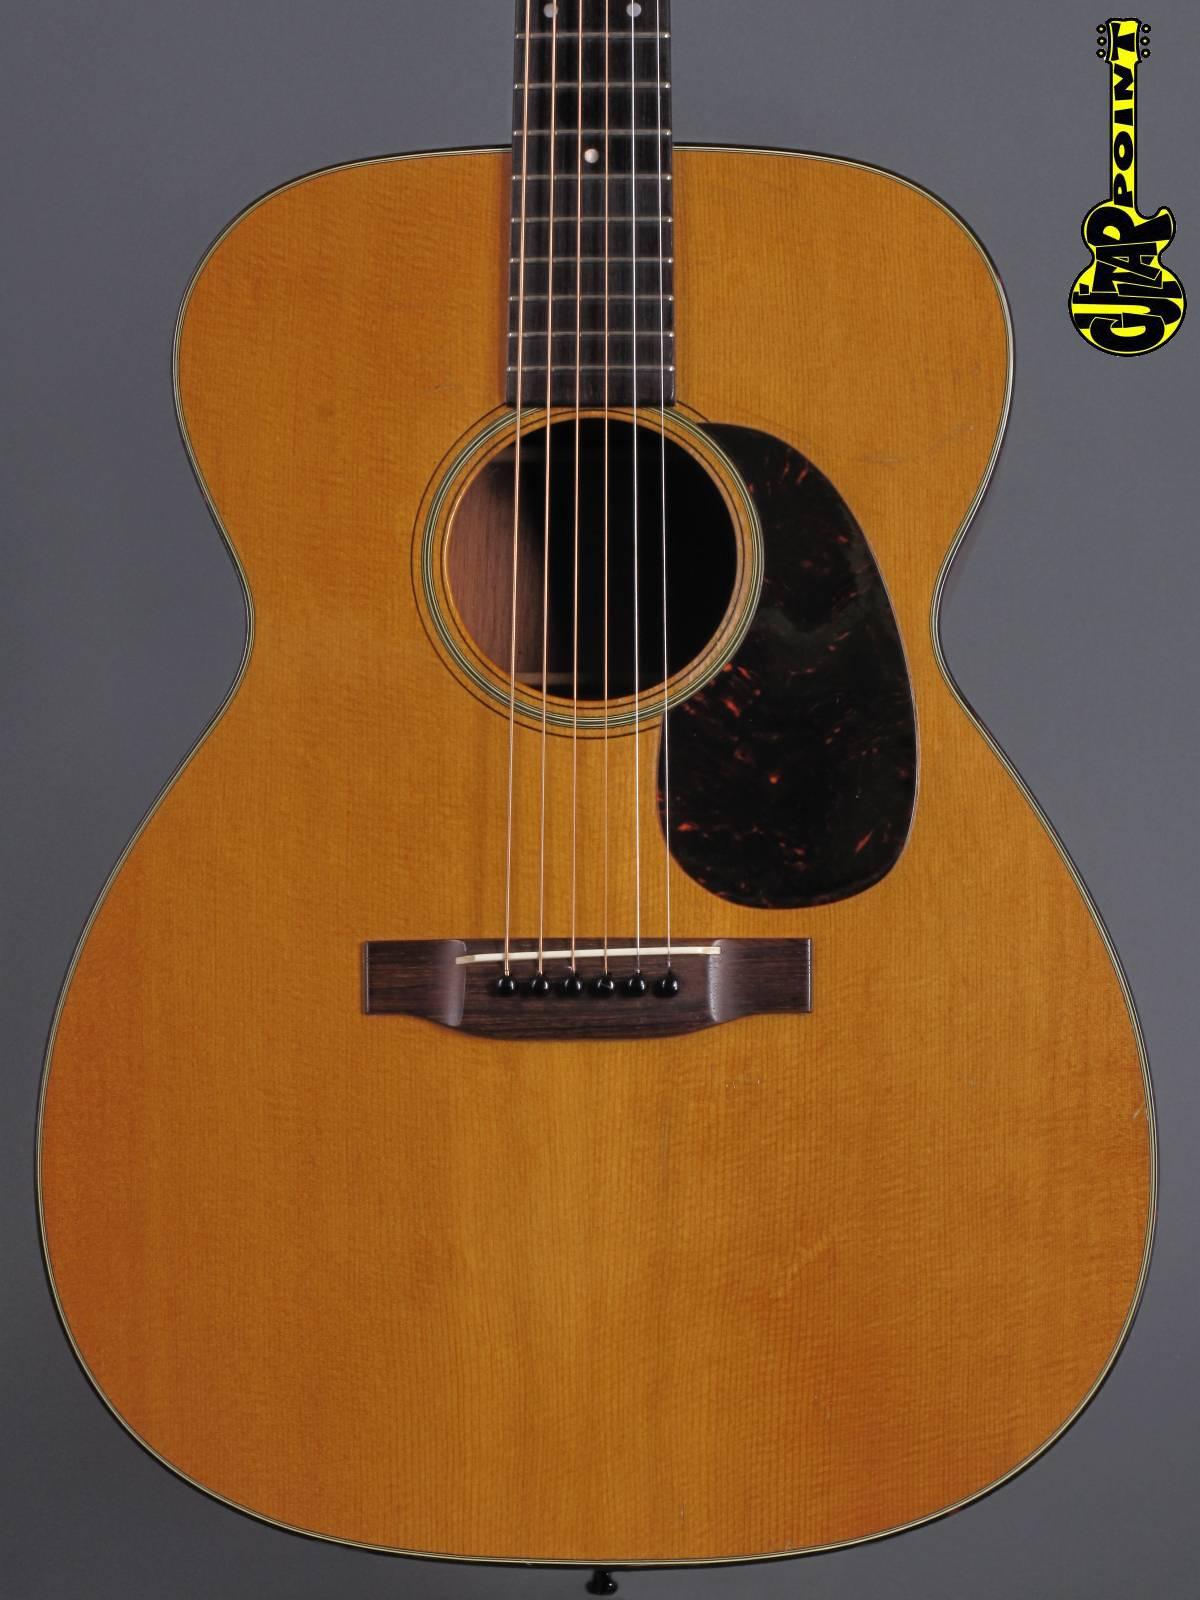 1959 Martin 000-18 - Natural